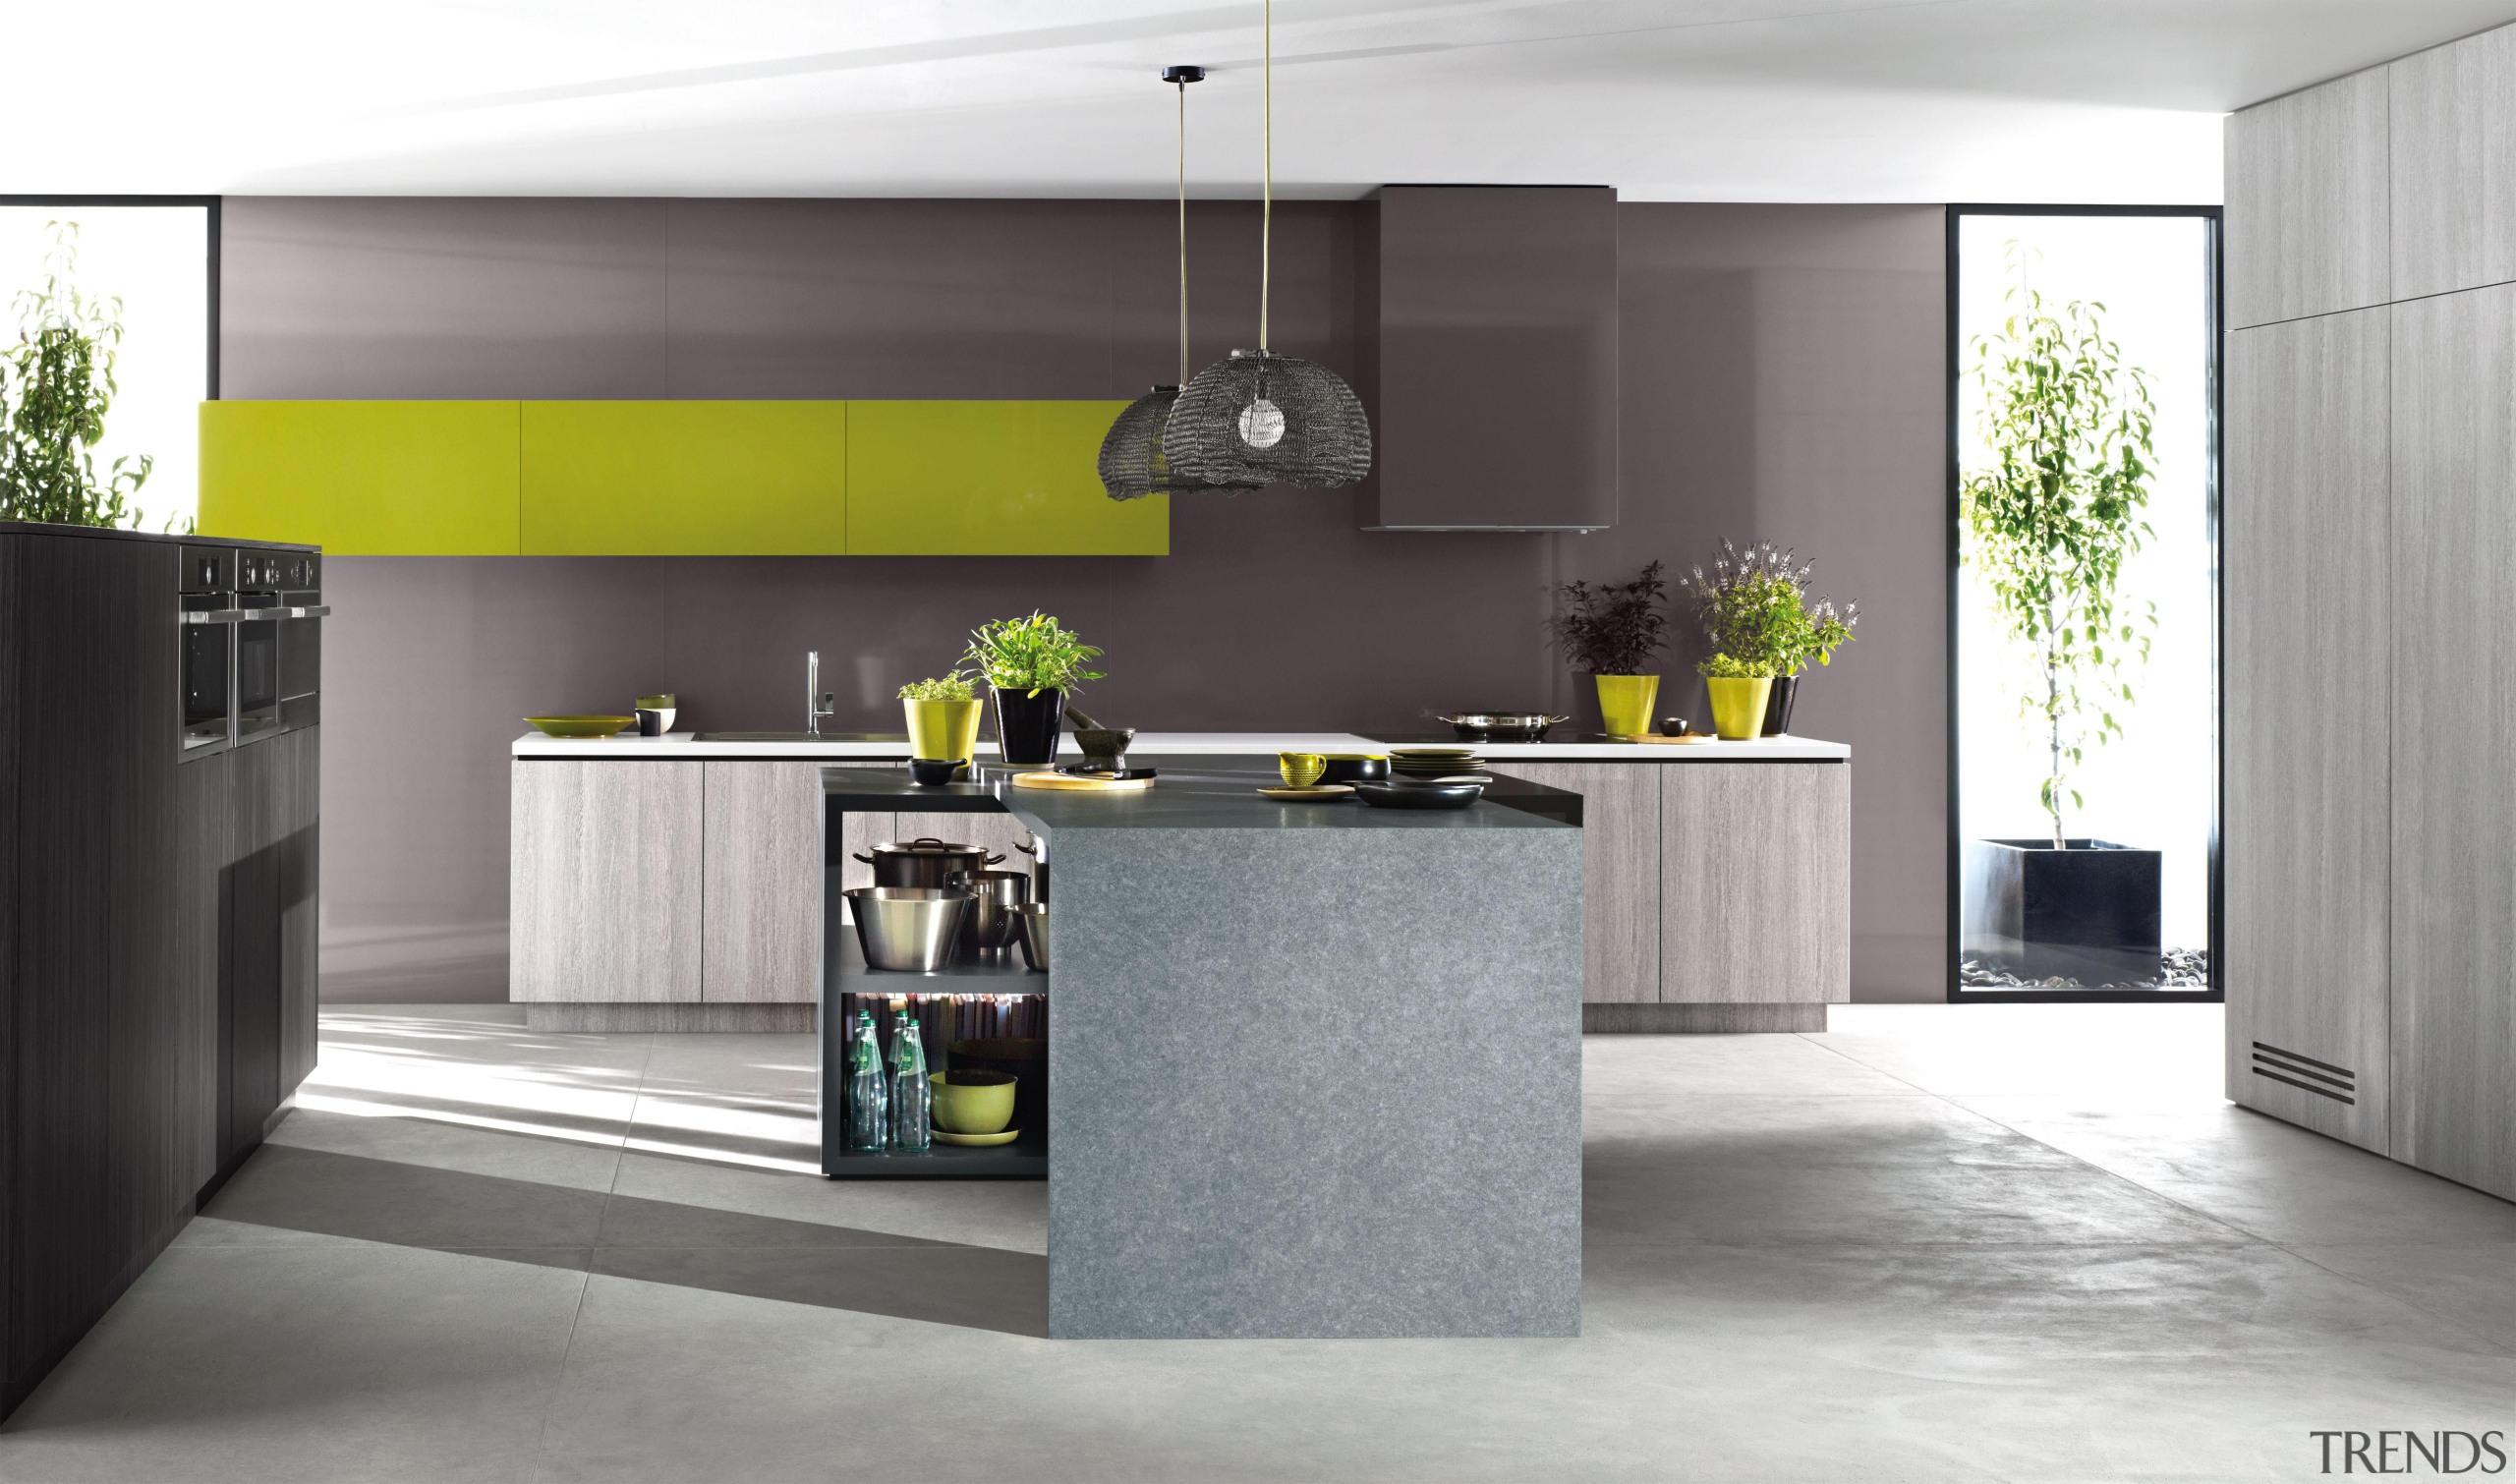 Formica® HPL is a postformable high pressuredecorative laminate. countertop, cuisine classique, floor, home appliance, interior design, kitchen, gray, white